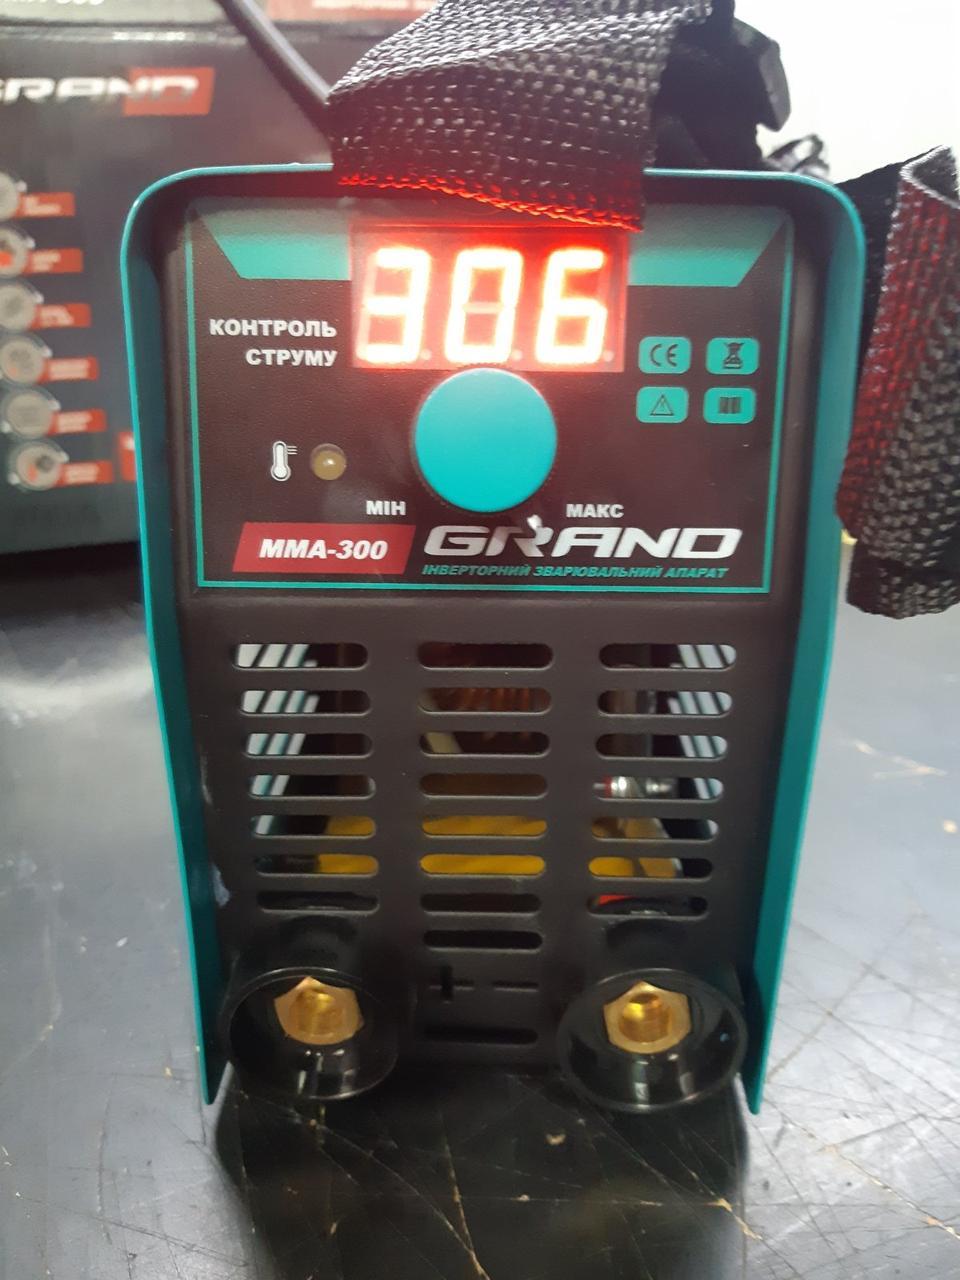 Сварочный инвертор Grand ММА-300 (LCD-дисплей)